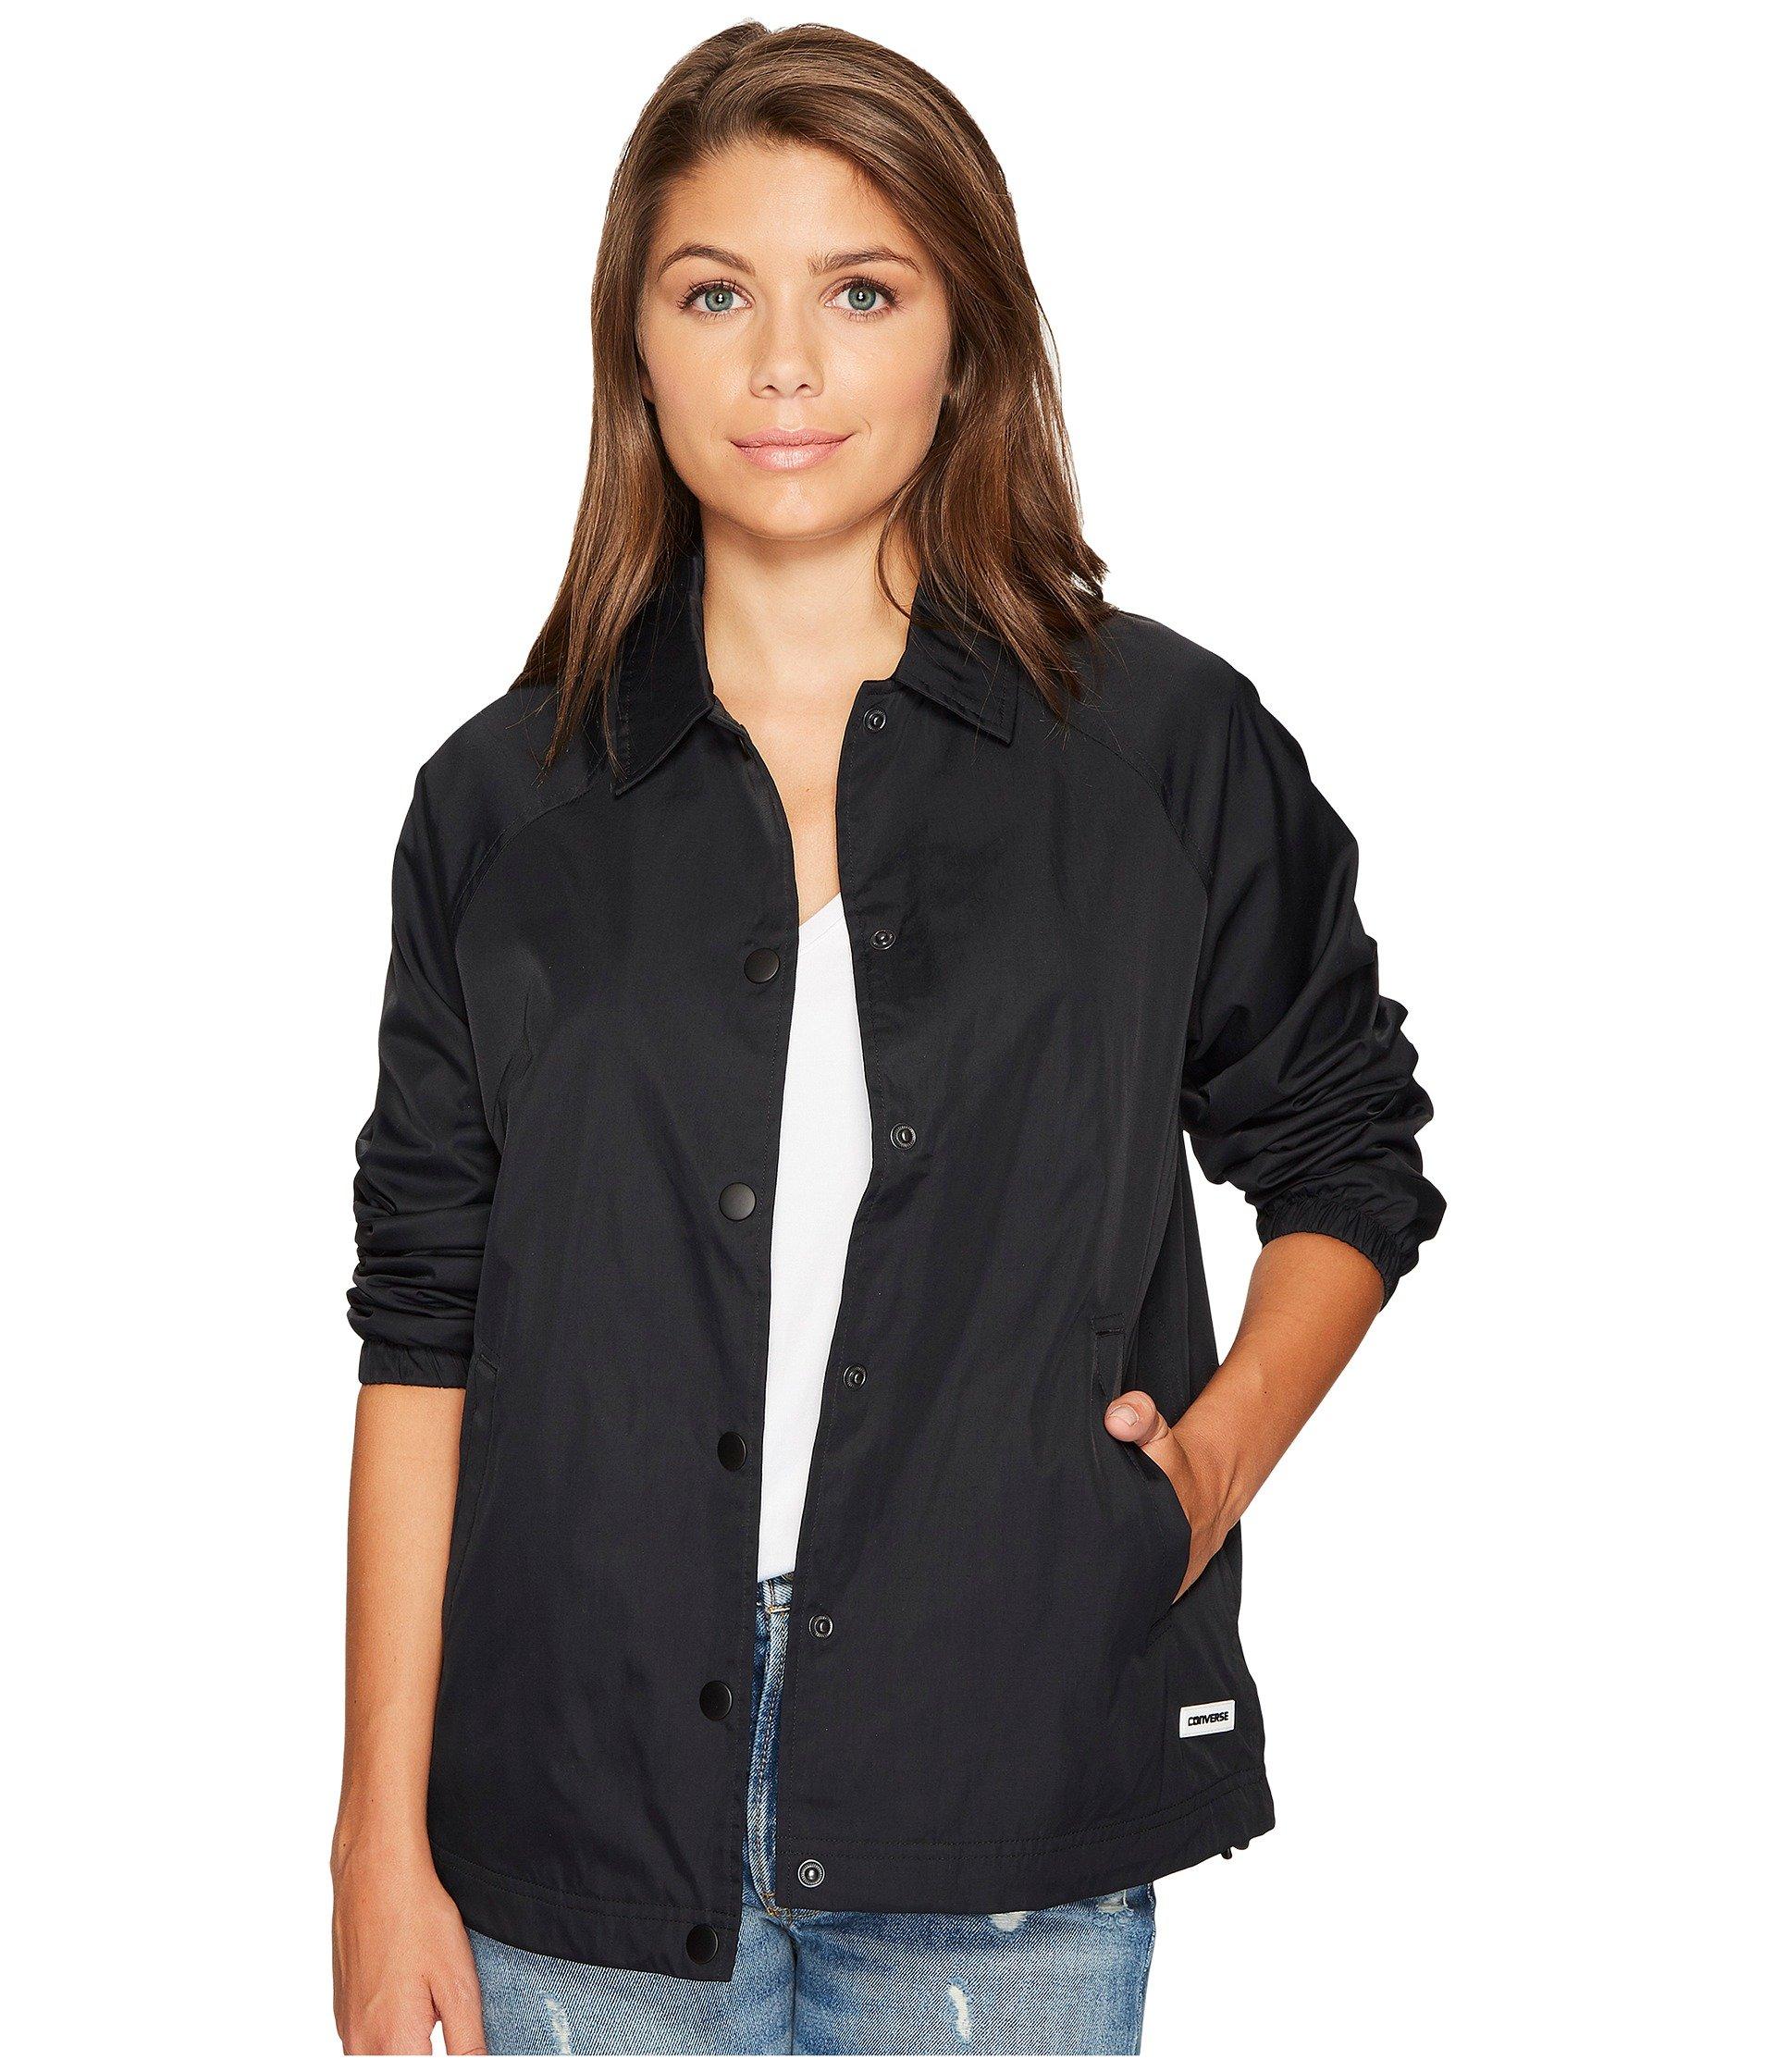 Core Coaches Jacket